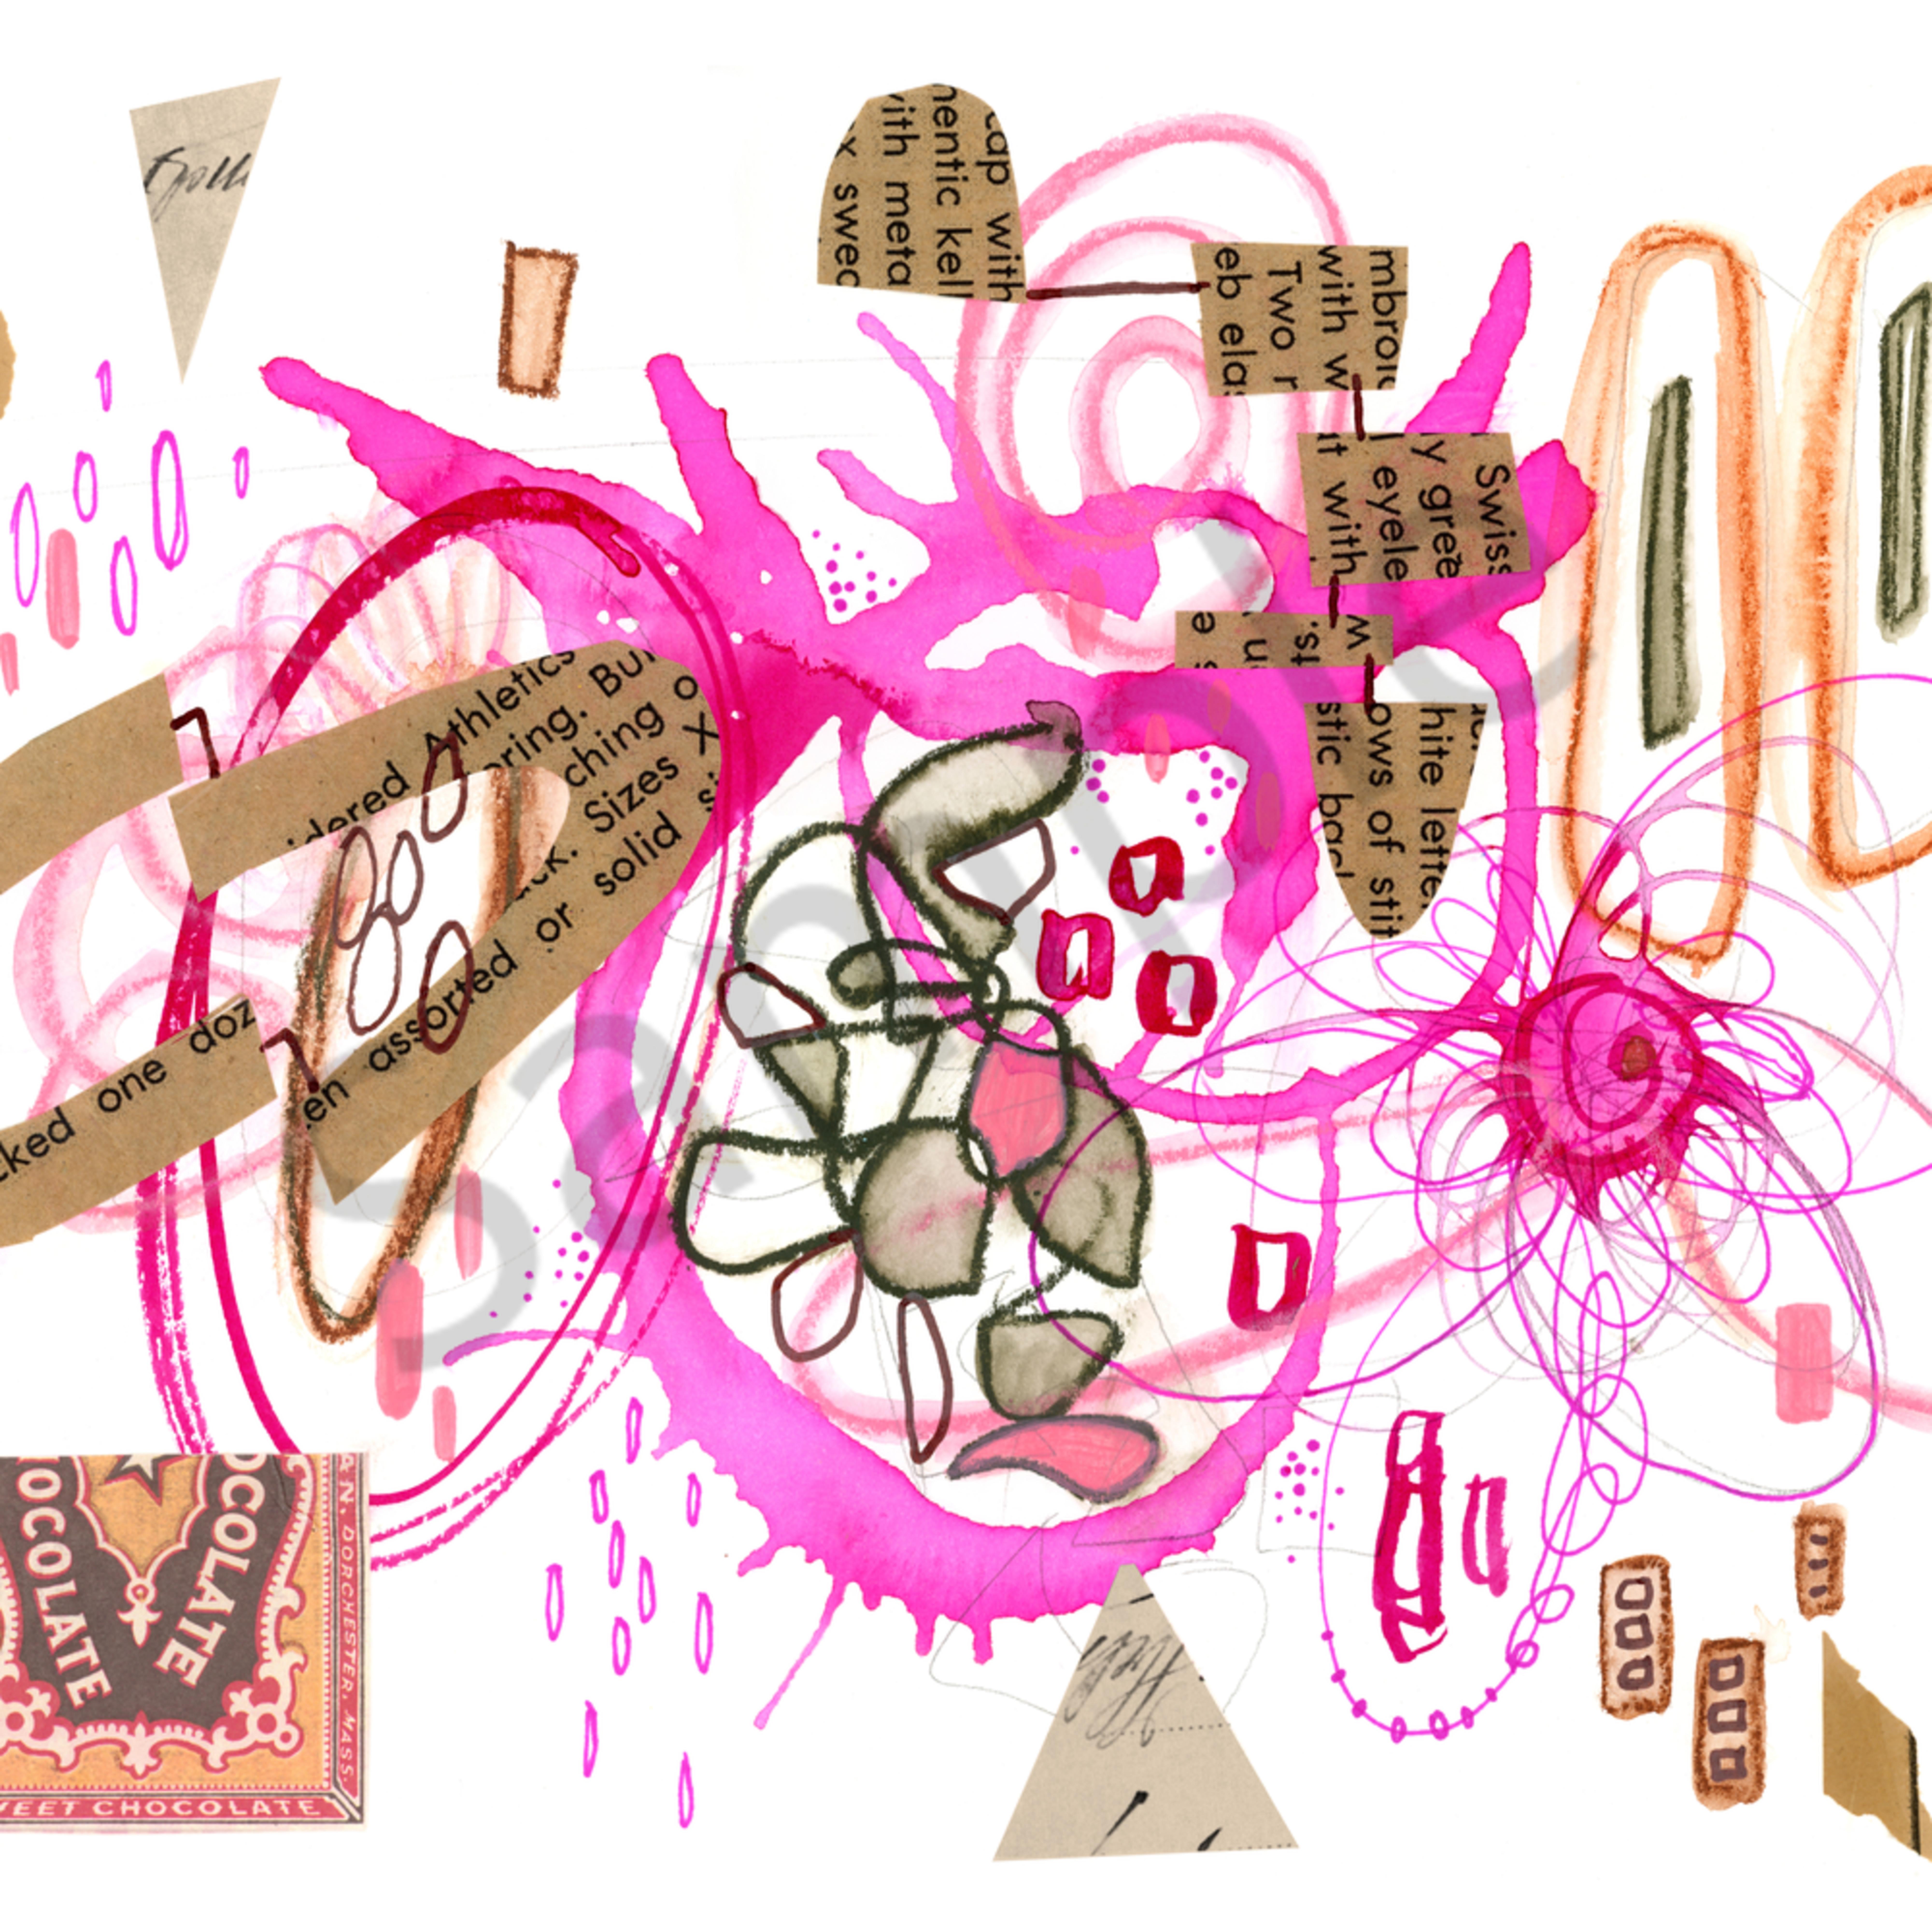 Abstract series1 pinkchoc 01 qmp757